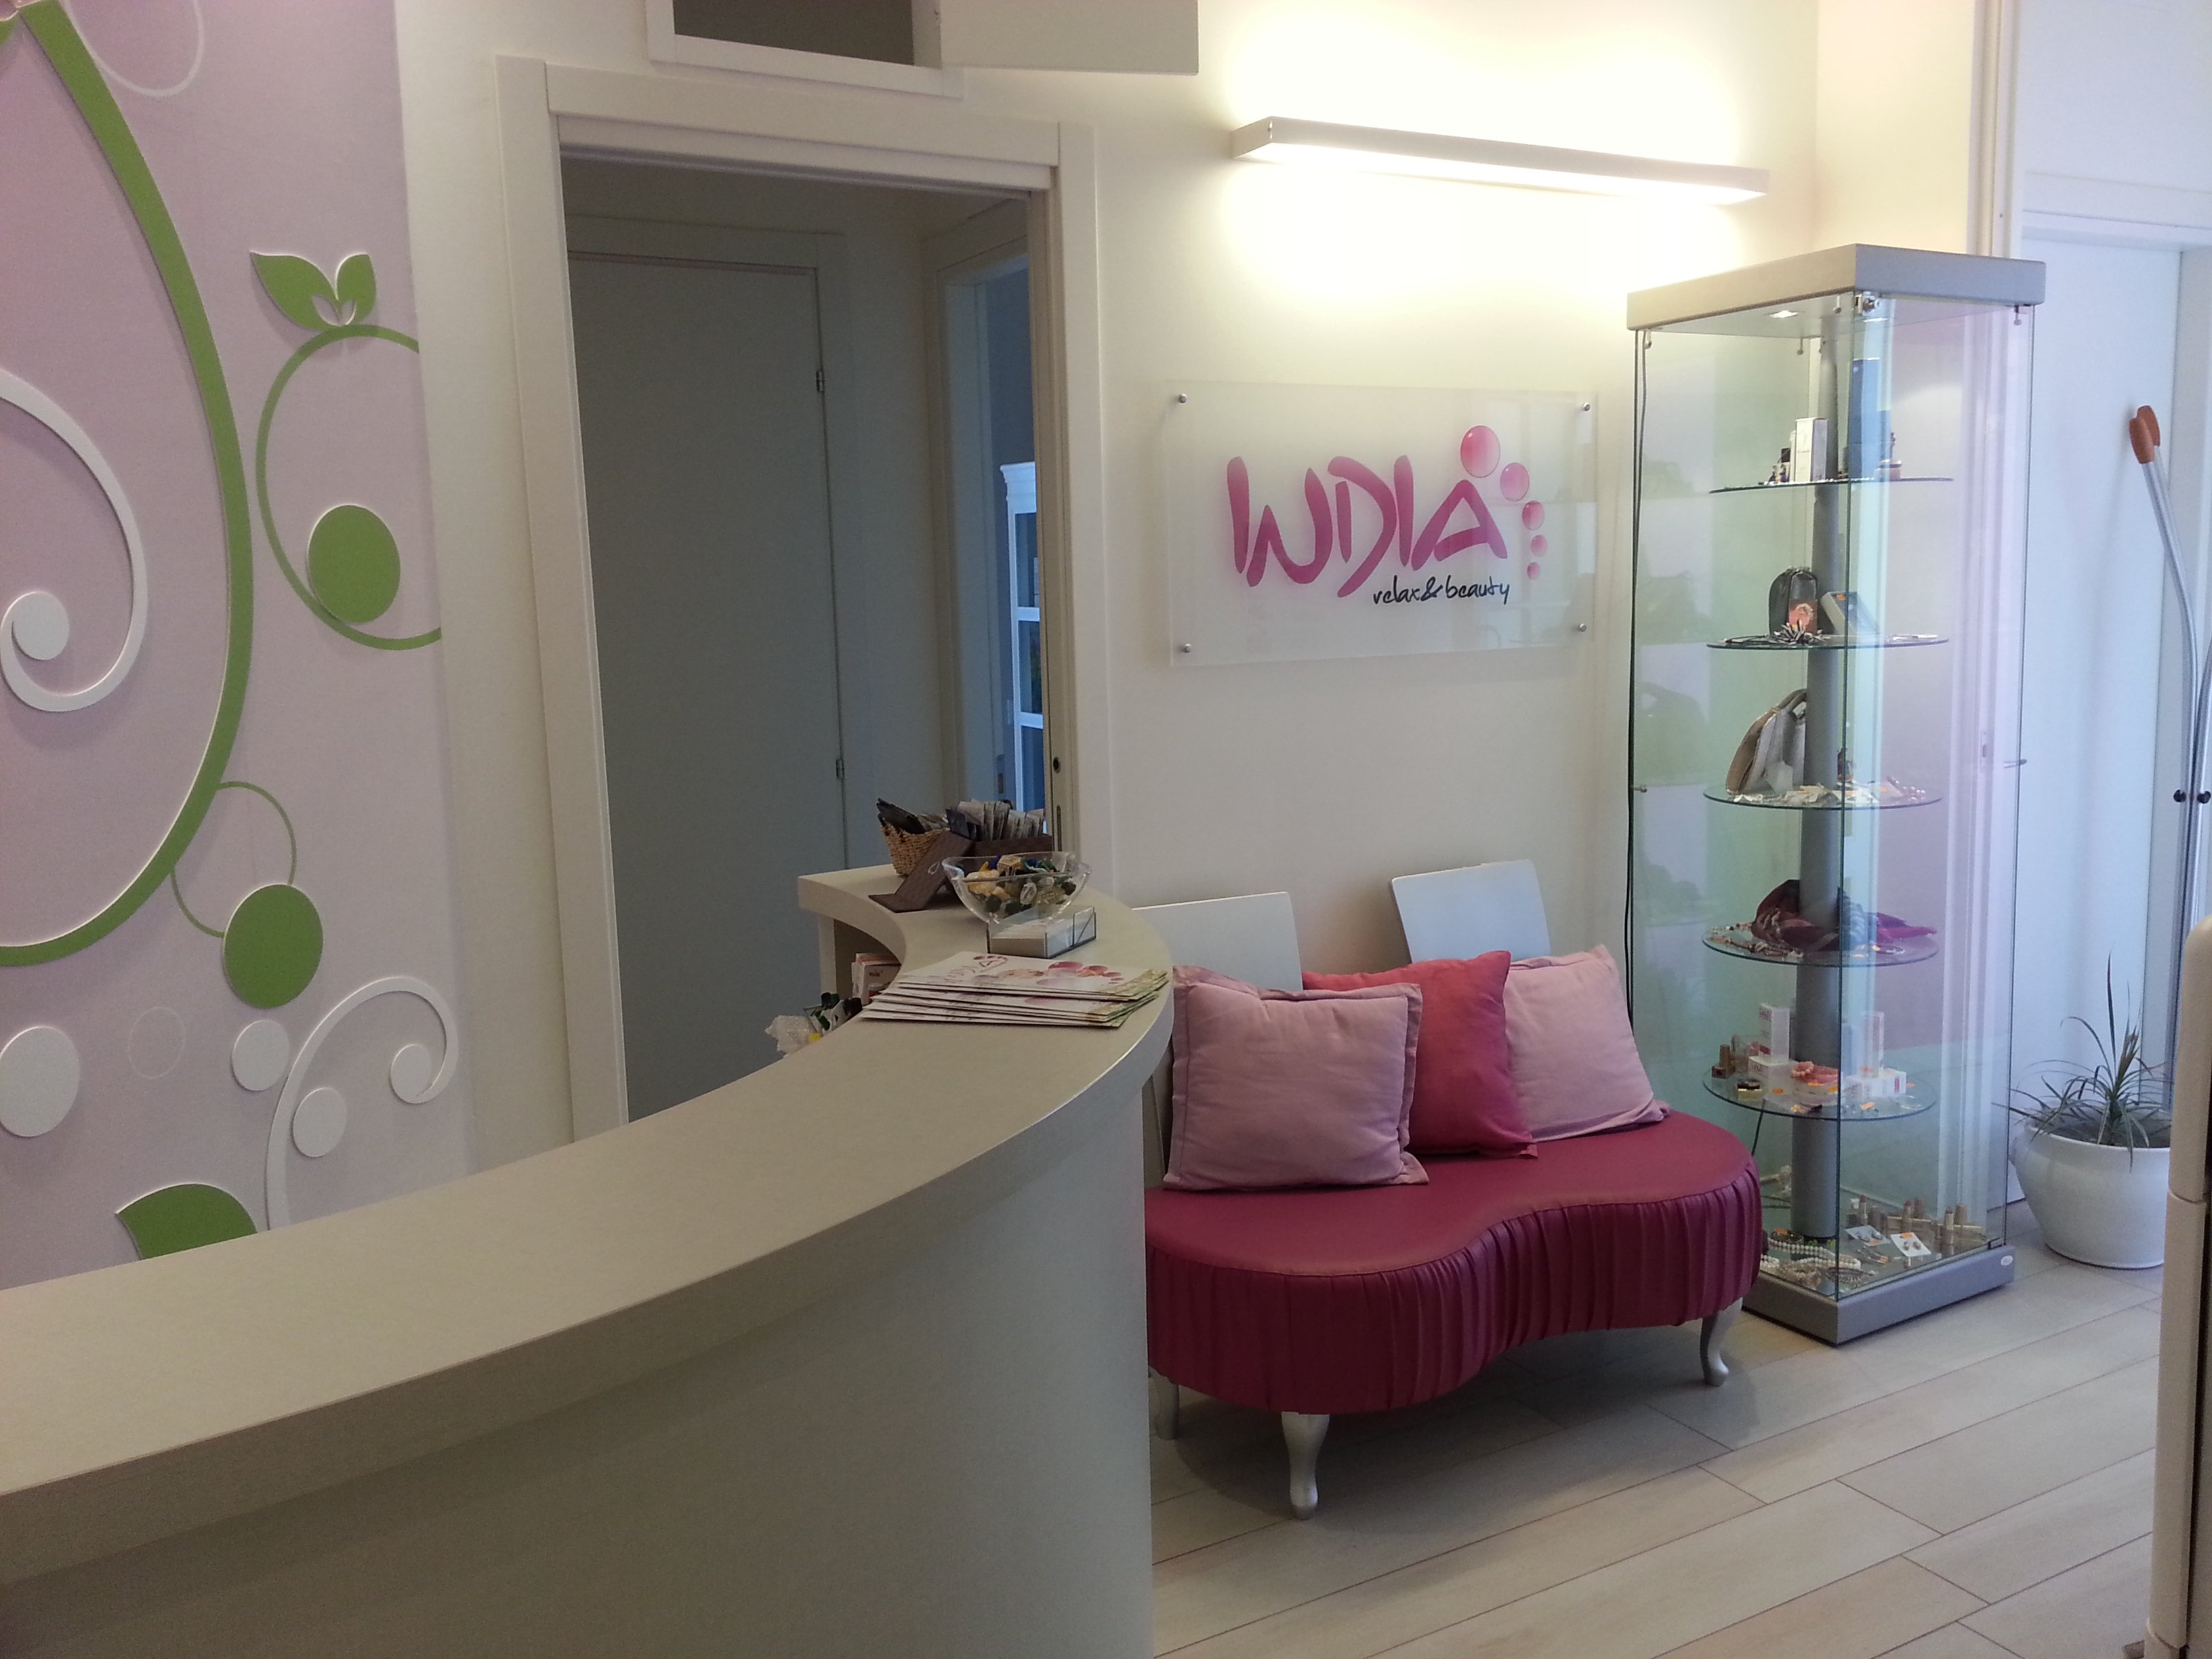 Ingresso del centro Indian Relax Beauty a Rimini